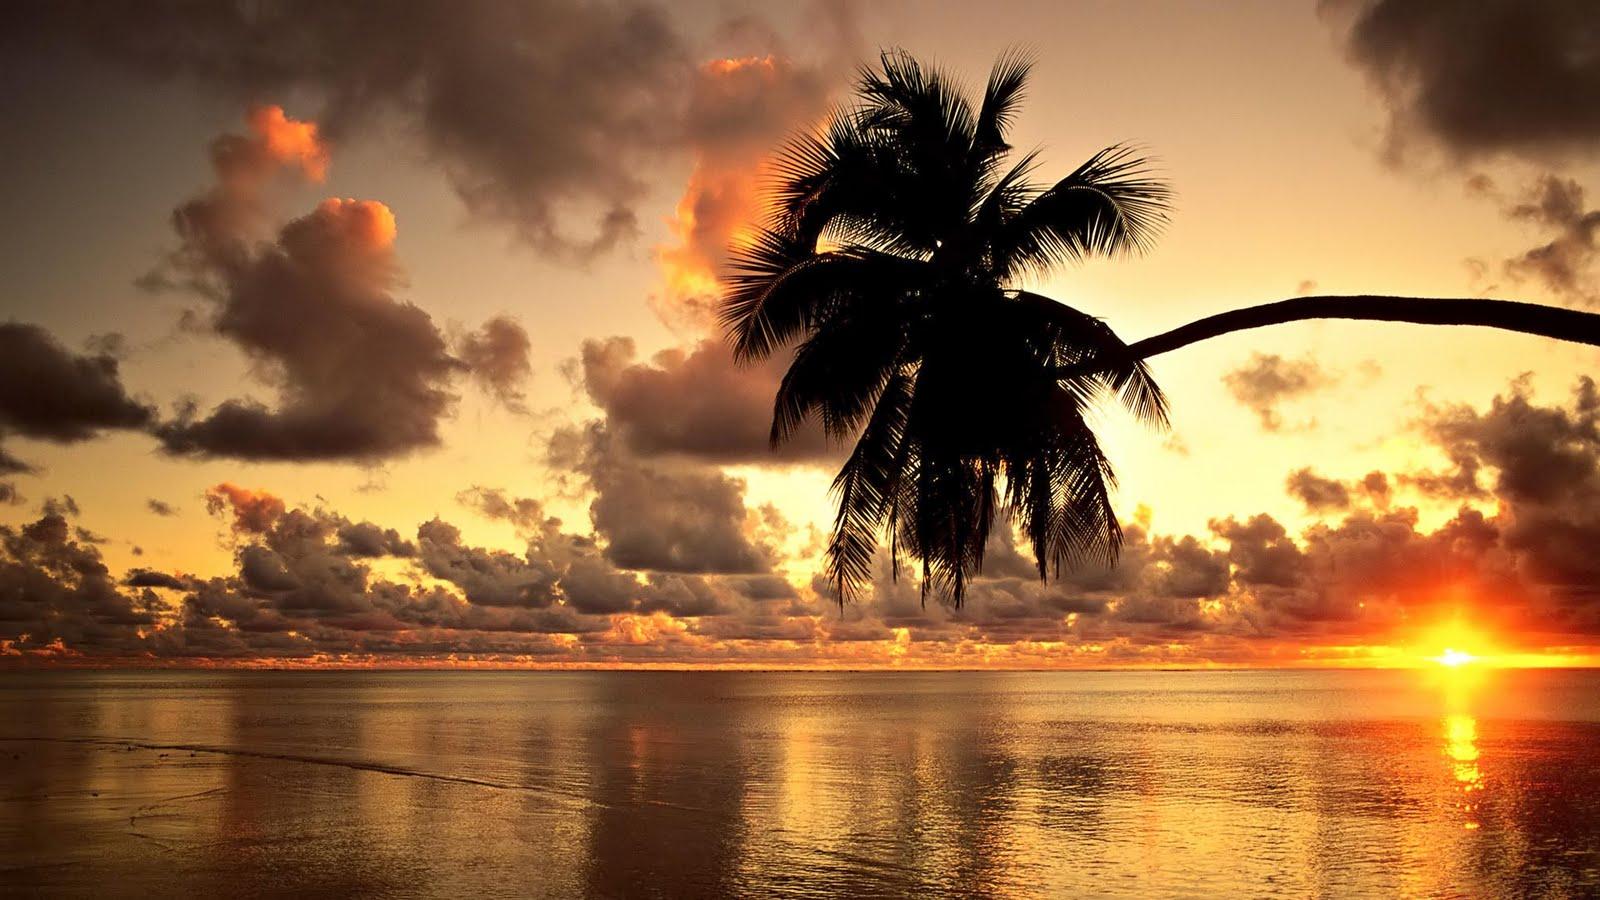 Hawaii Condos Golden sunset hd wallpaper - Beauty O'v NaTuRe ....... !!!!!!!!